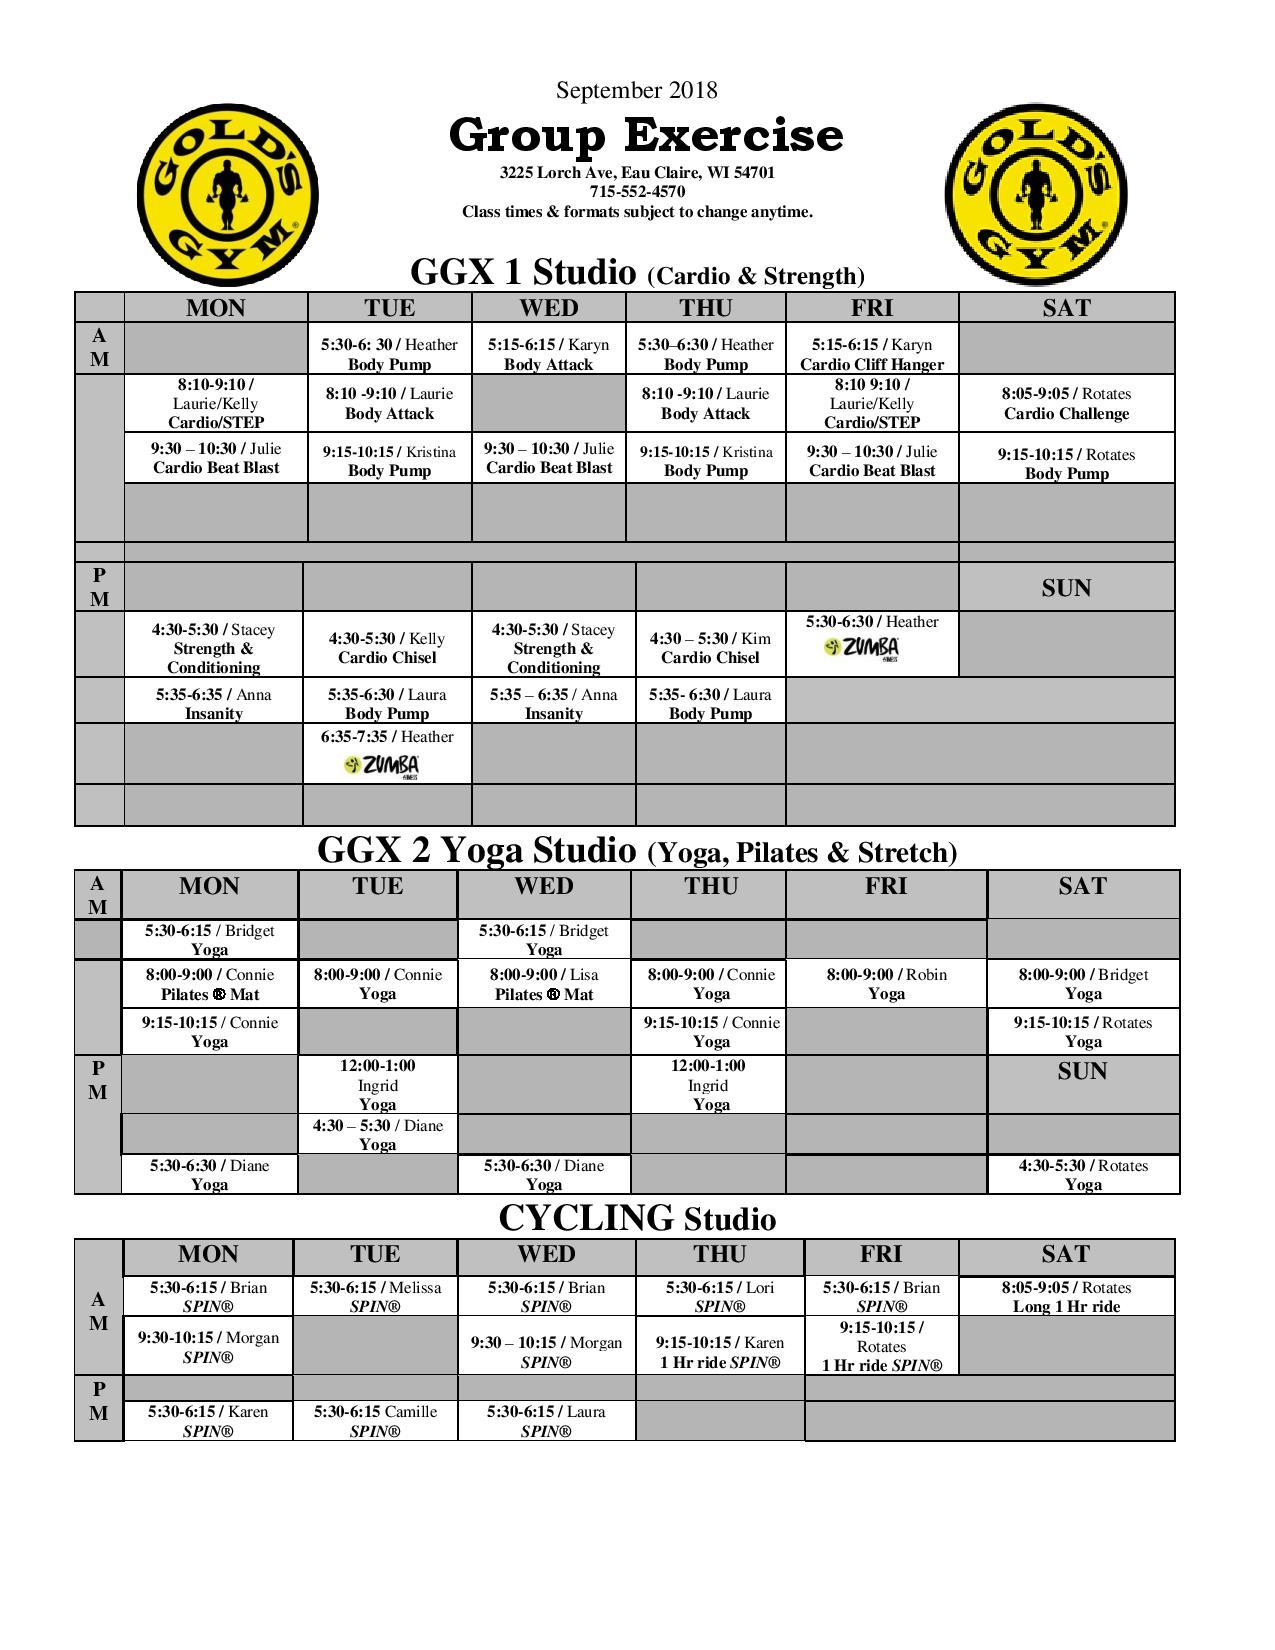 gold's gym eau claire | group exercise classes